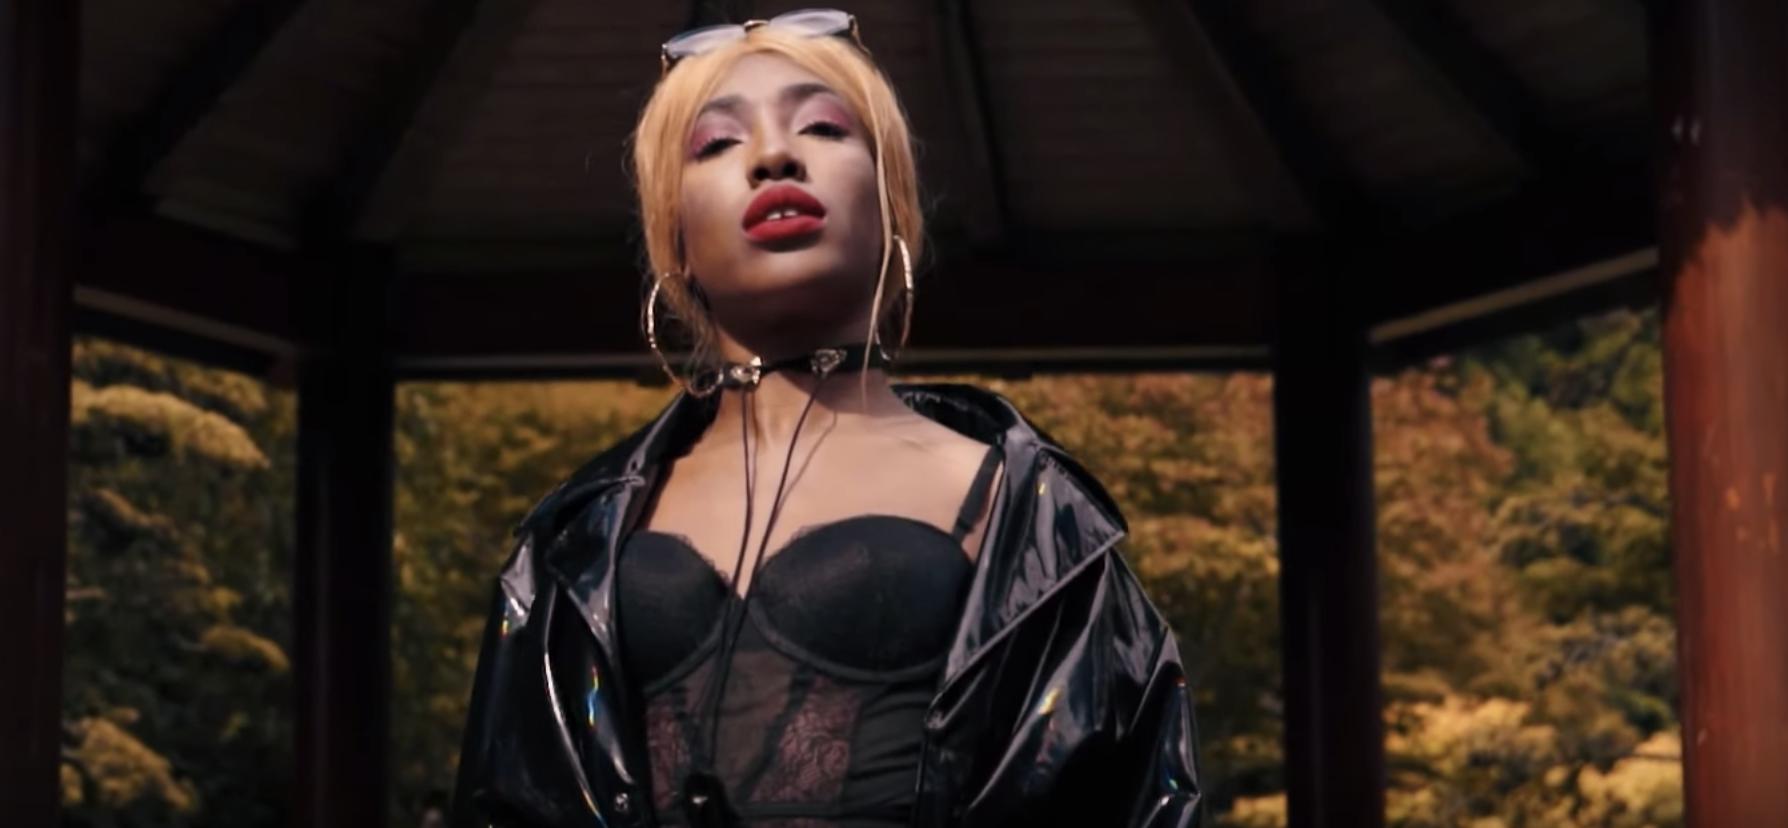 Eunique - Kobra Kartell (Video) | 16BARS